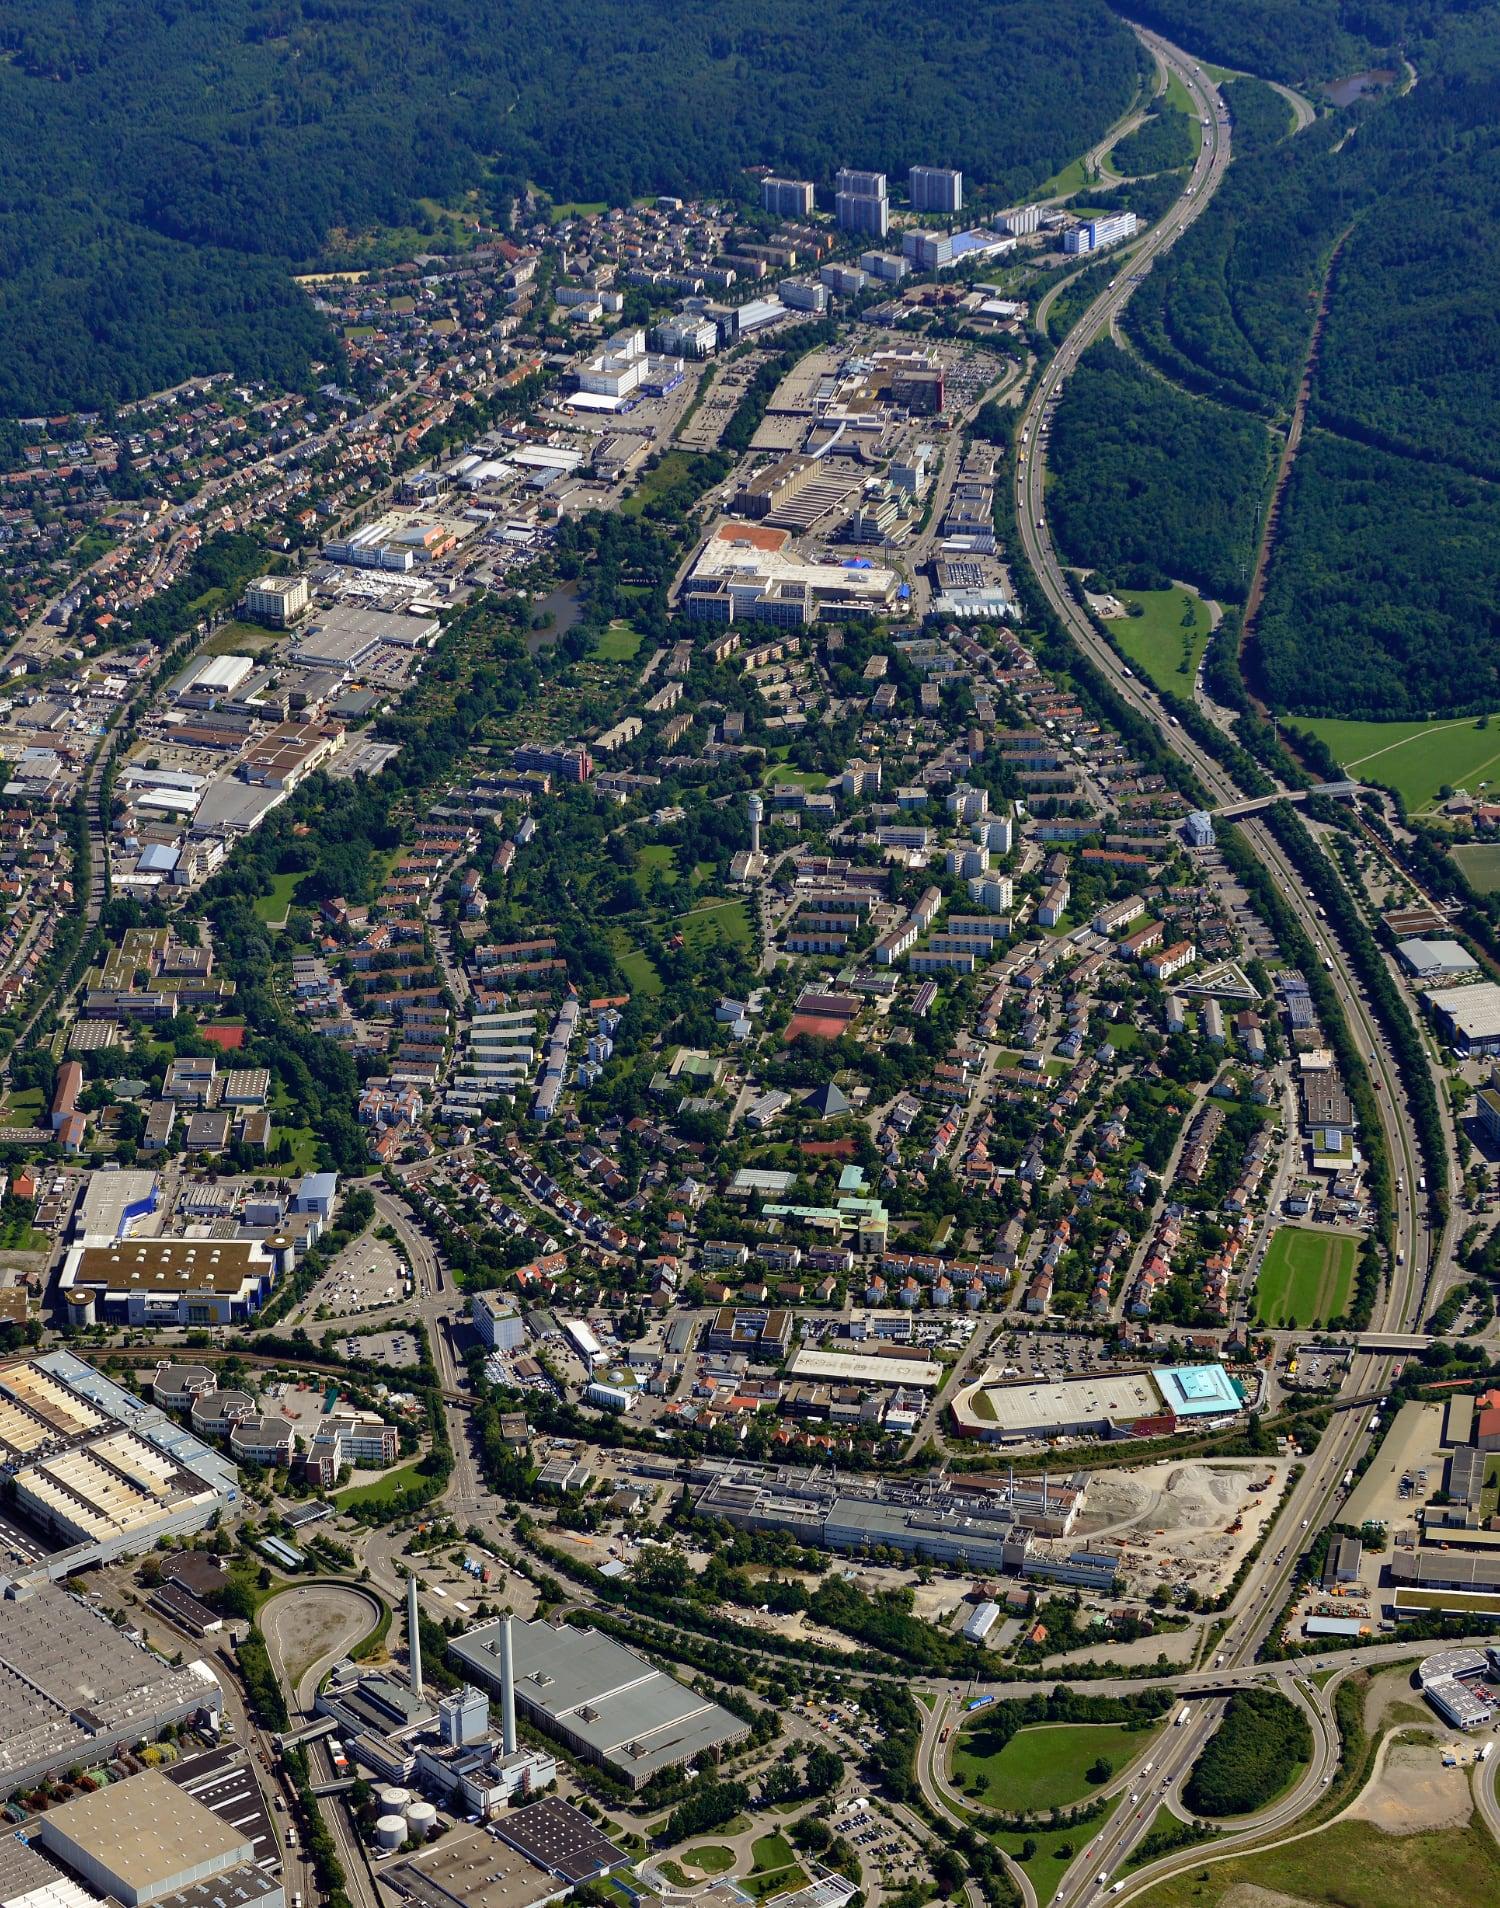 Luftbild Daimler Kernstadt